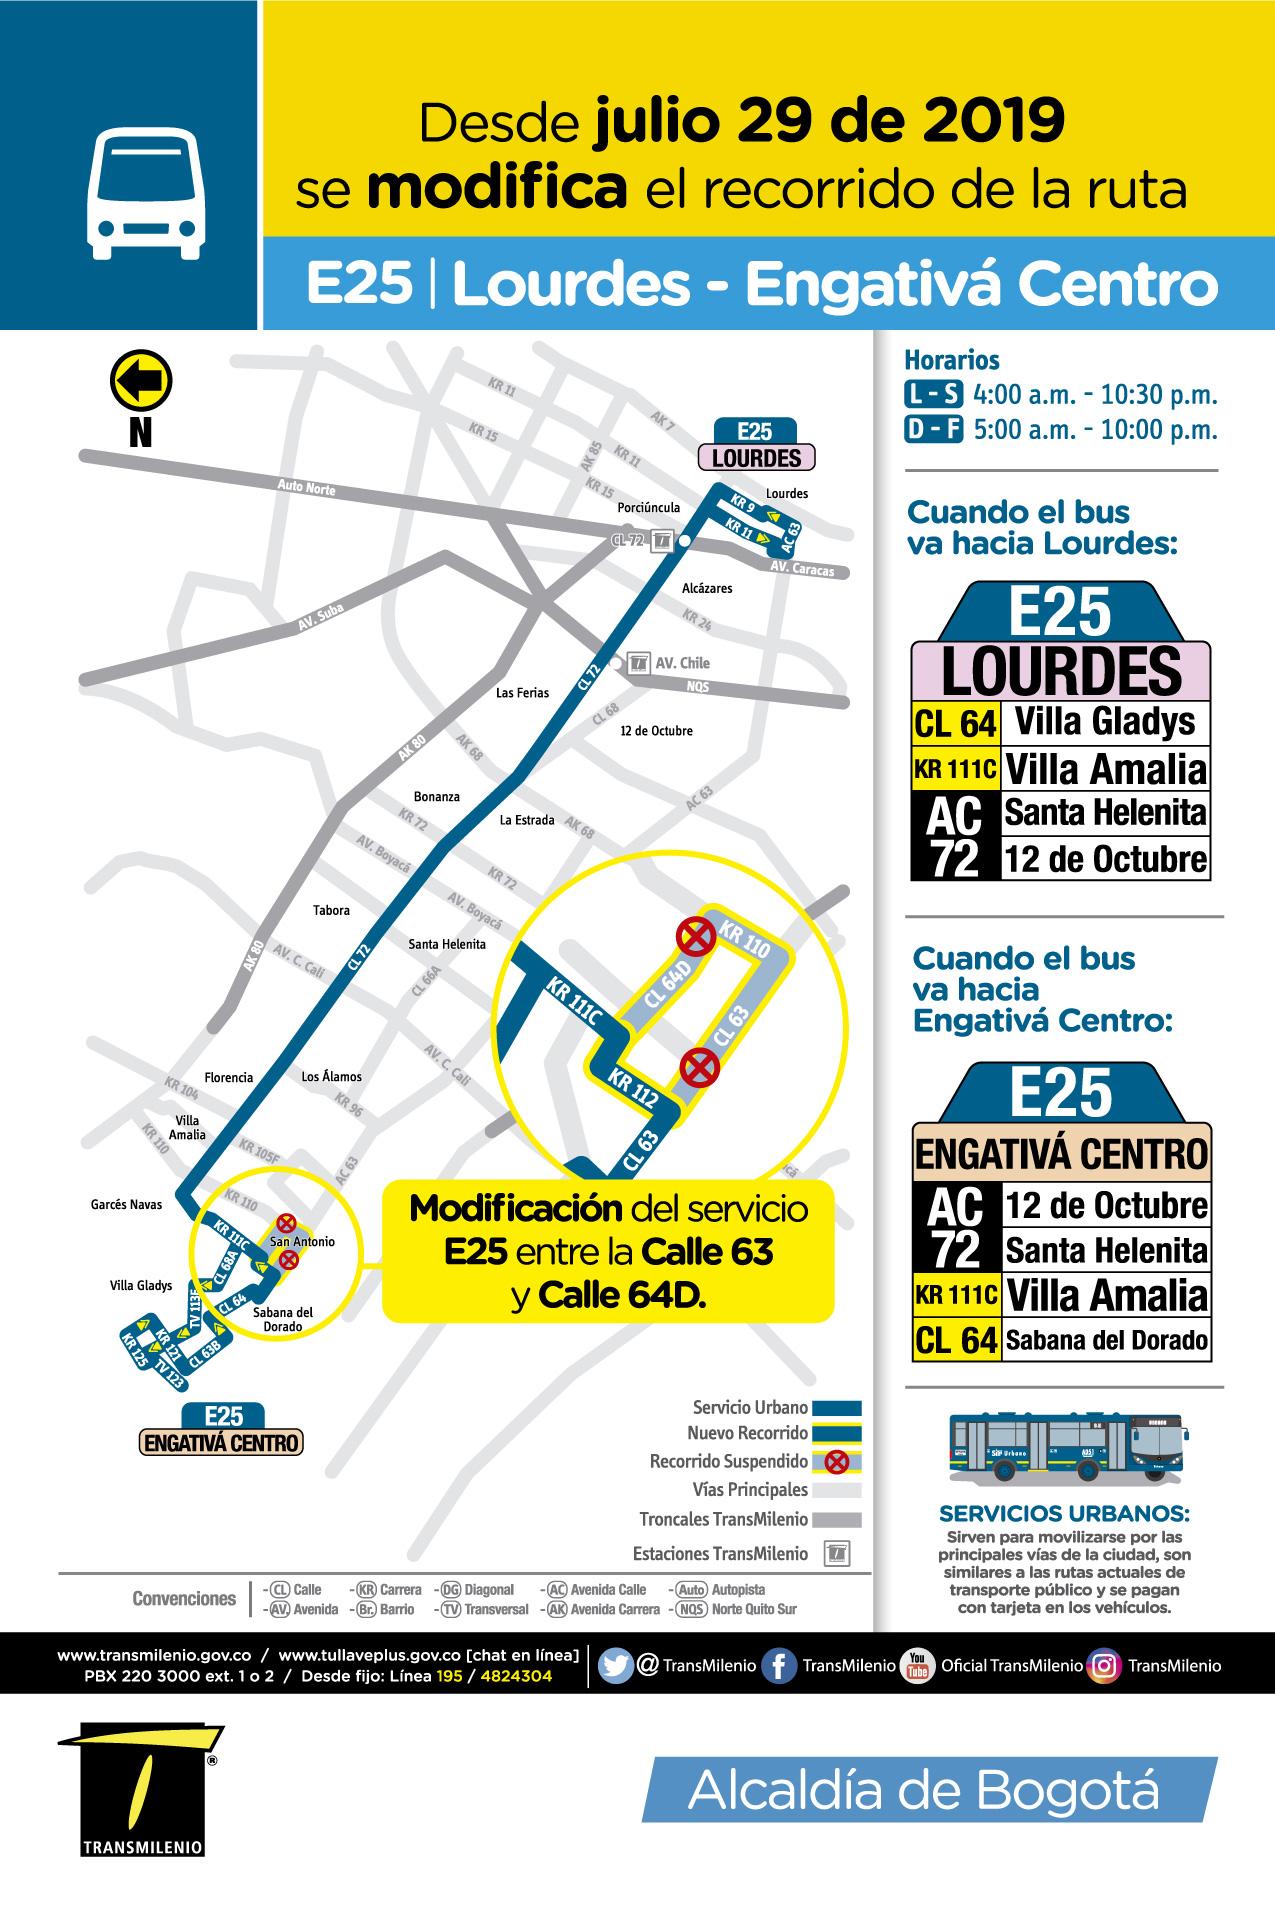 Mapa de la ruta E25 con novedades